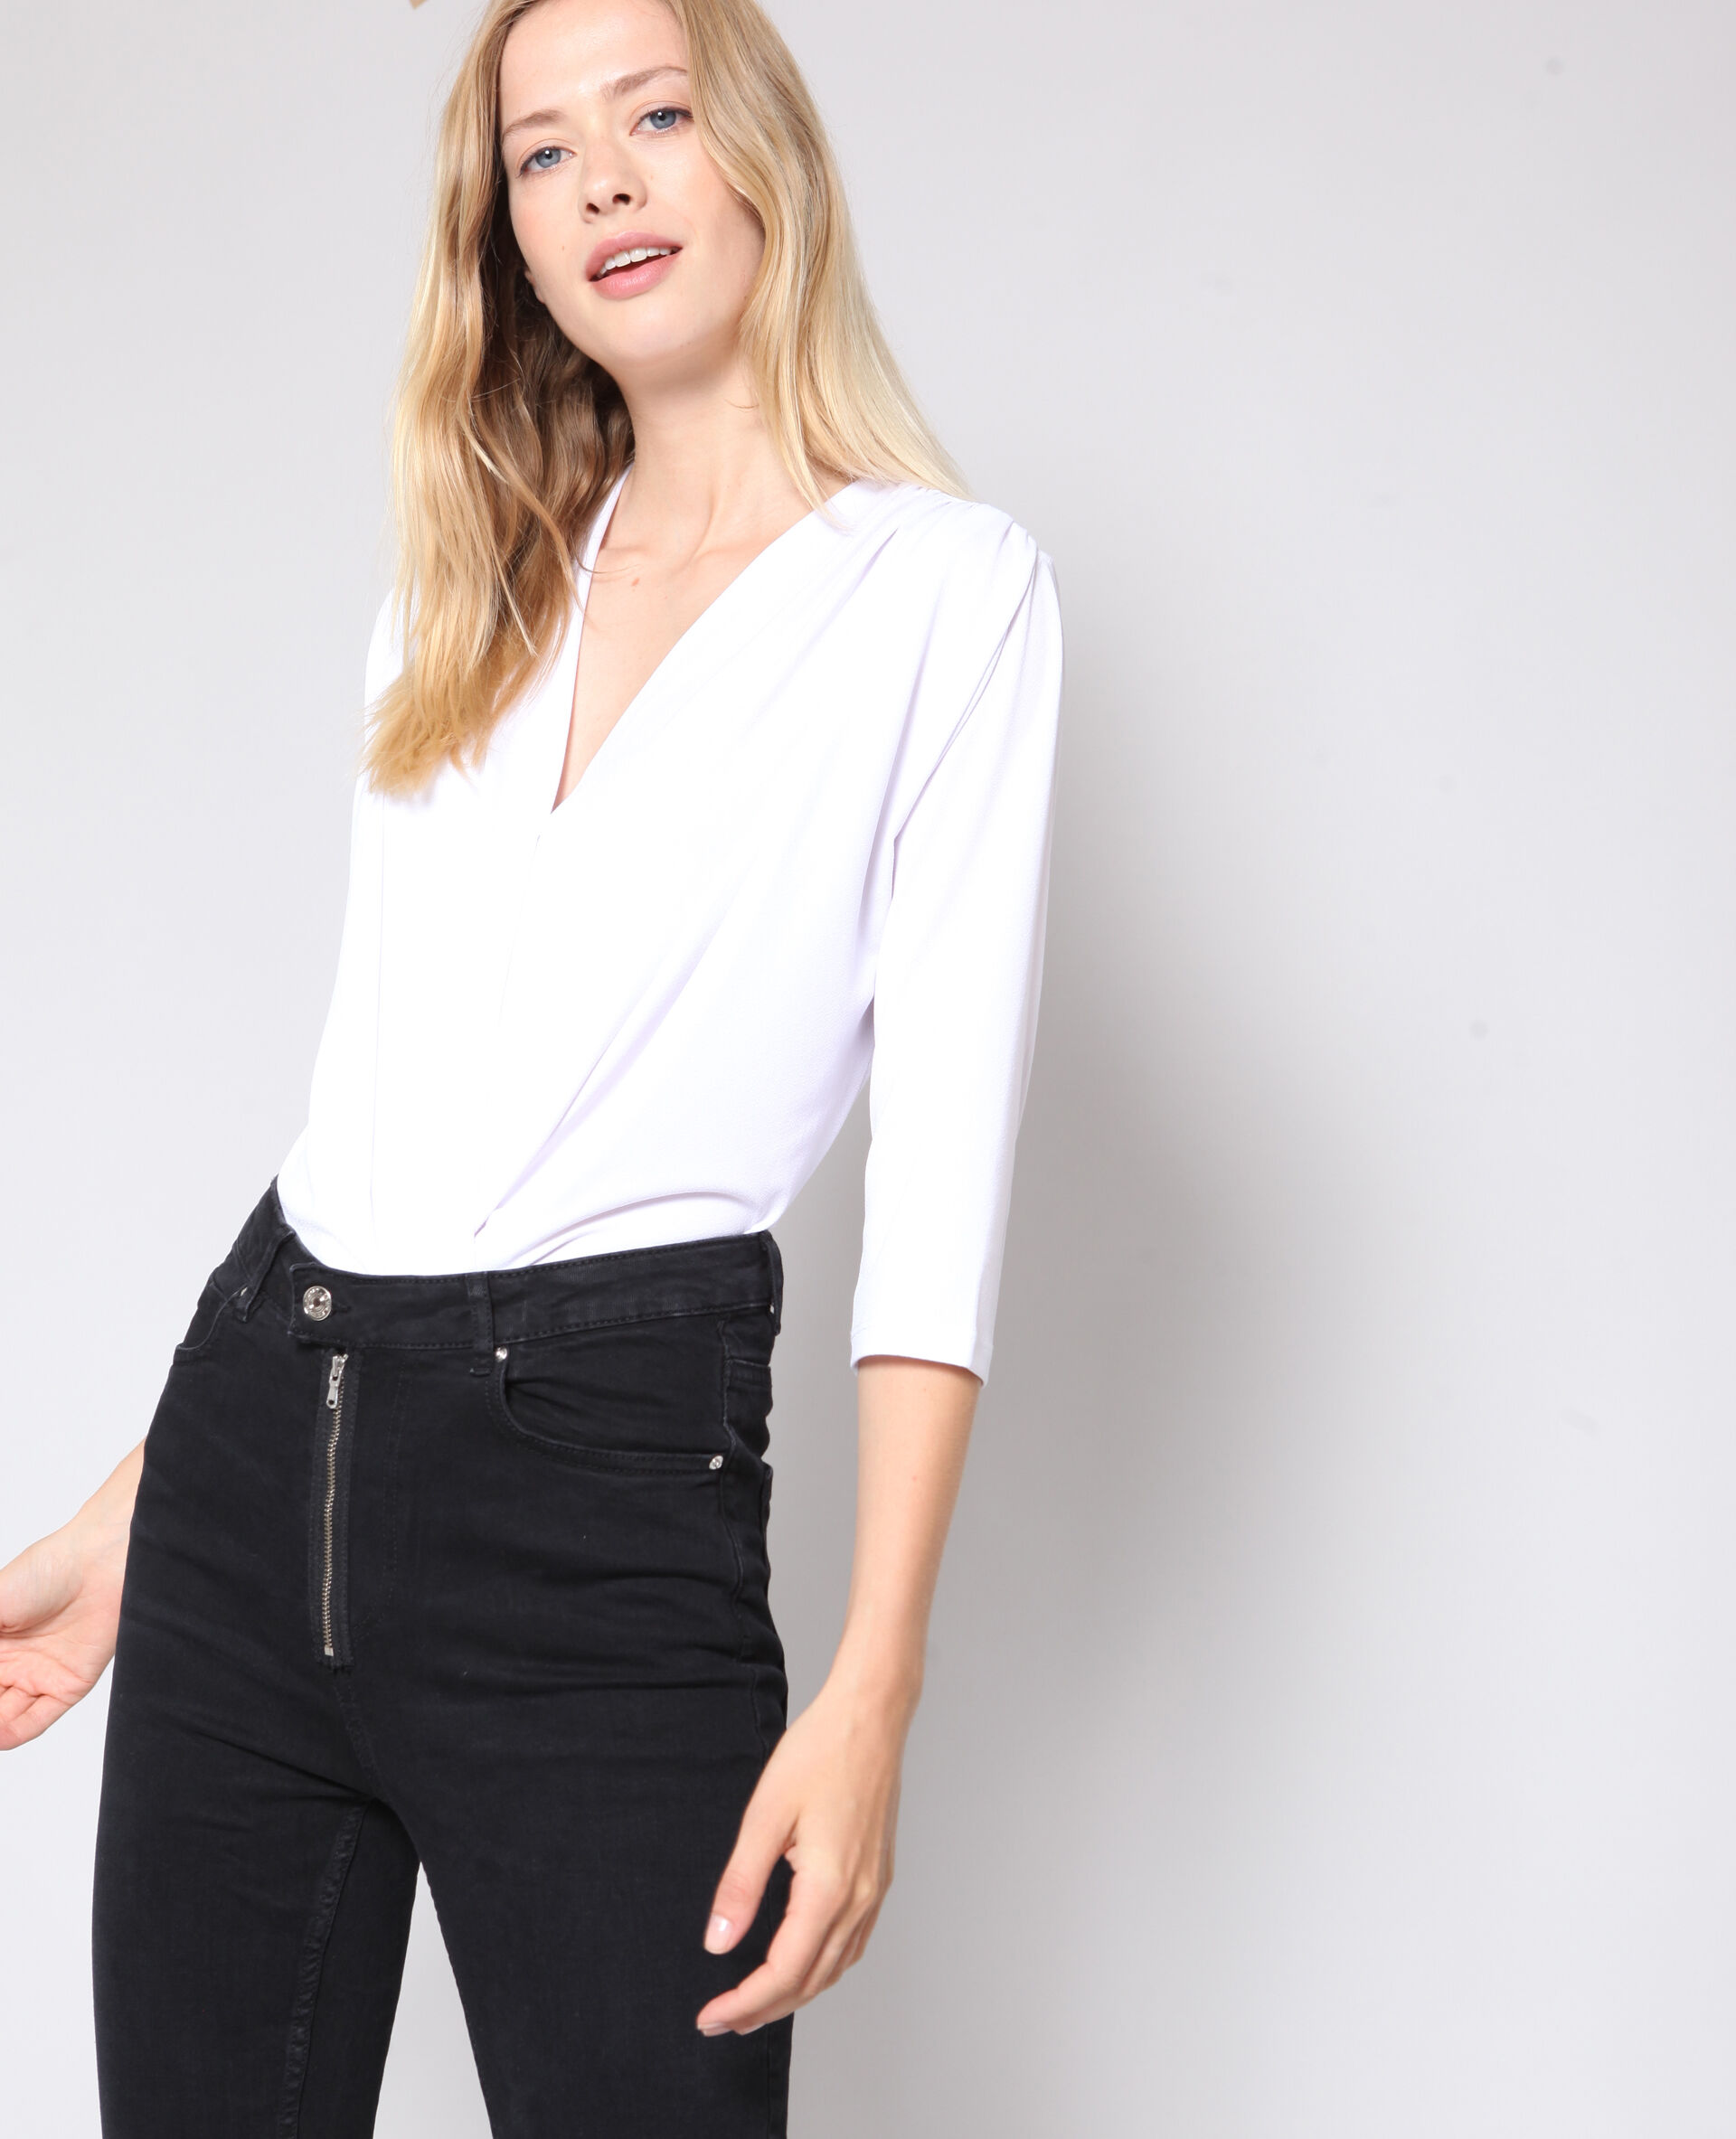 Soldes Body chemisier Femme -20% - Couleur blanc - Taille S - PIMKIE - Mode Femme